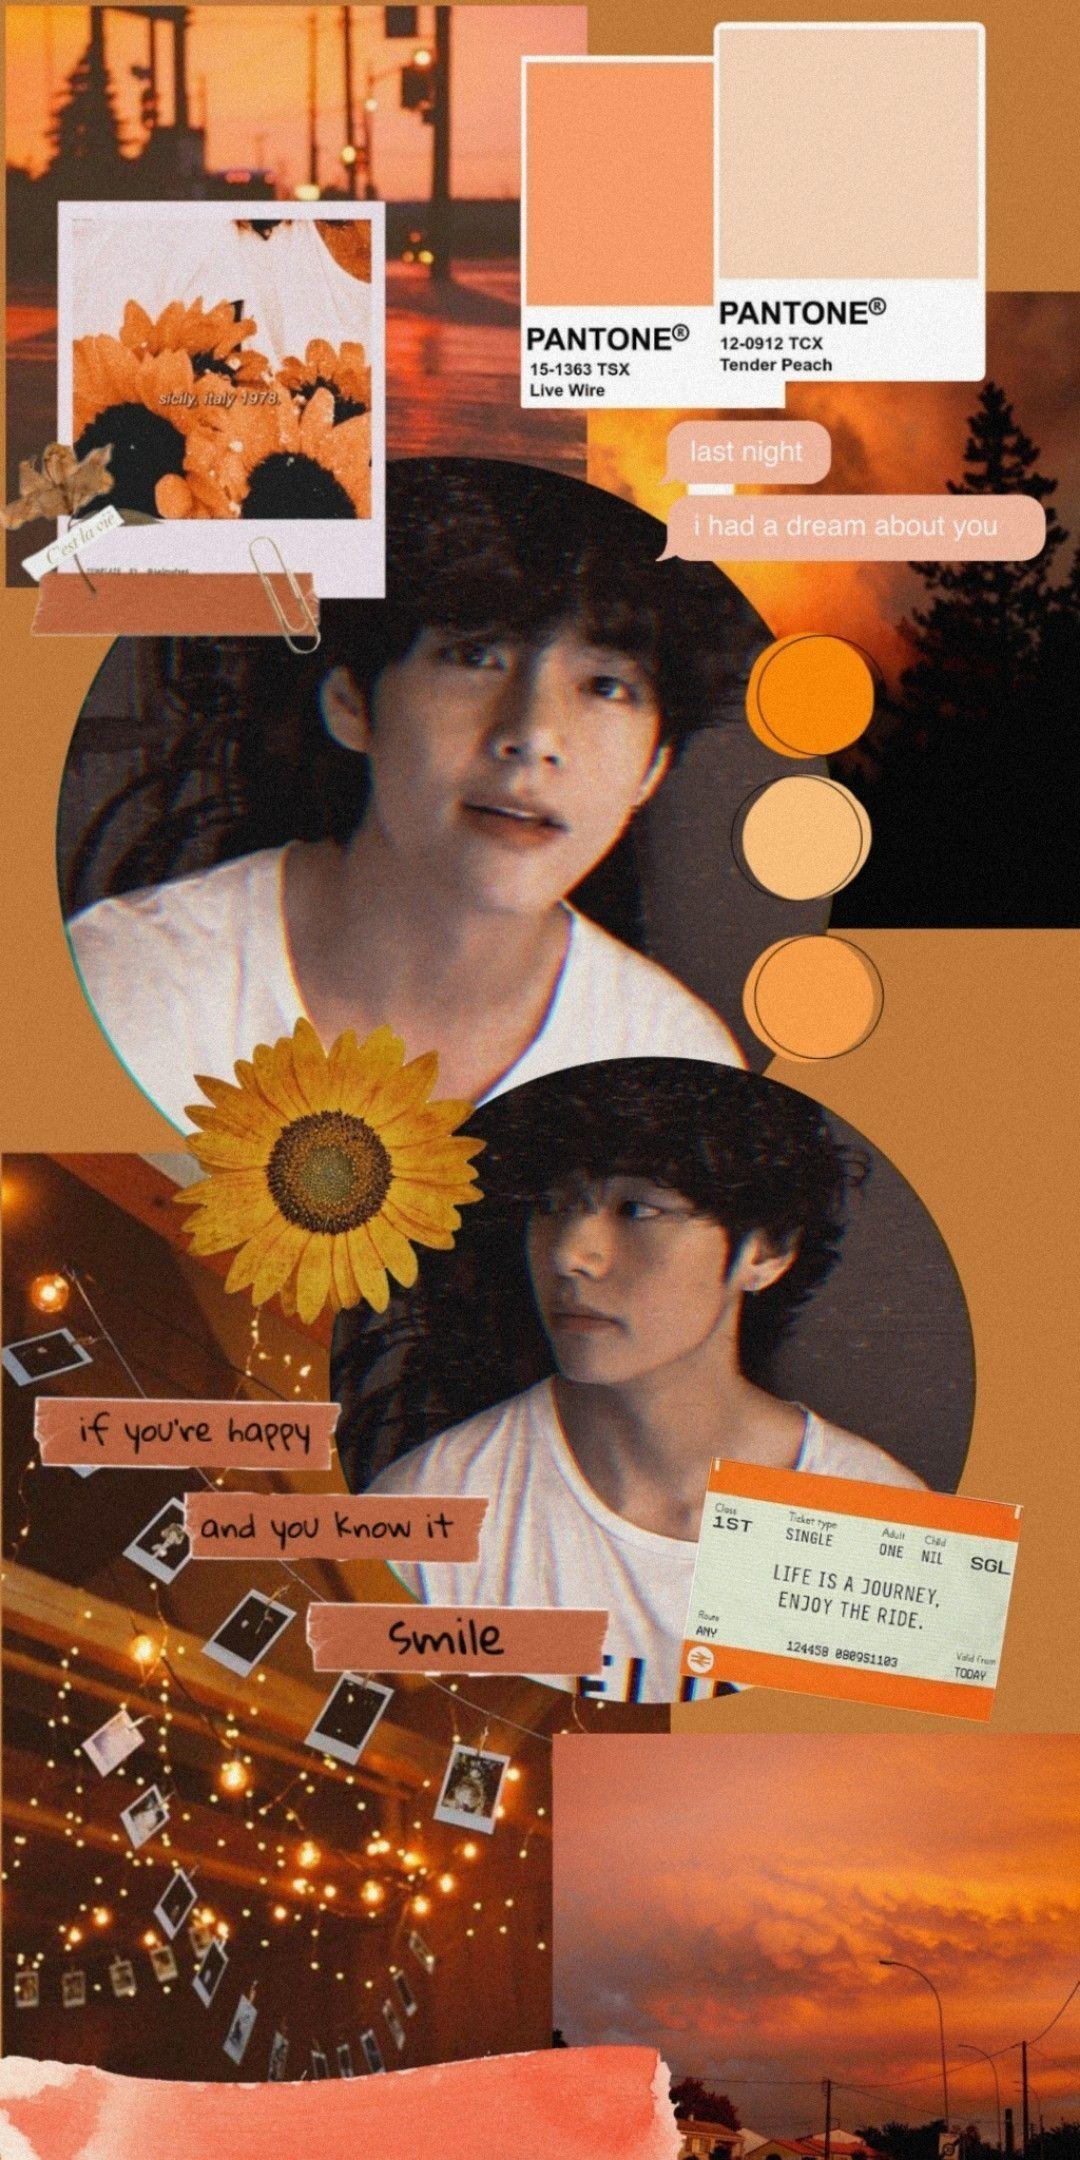 Kim Taehyung V Bts Lockscreen Kim Taehyung Wallpaper Bts Aesthetic Wallpaper For Phone Bts Aesthetic Pictures